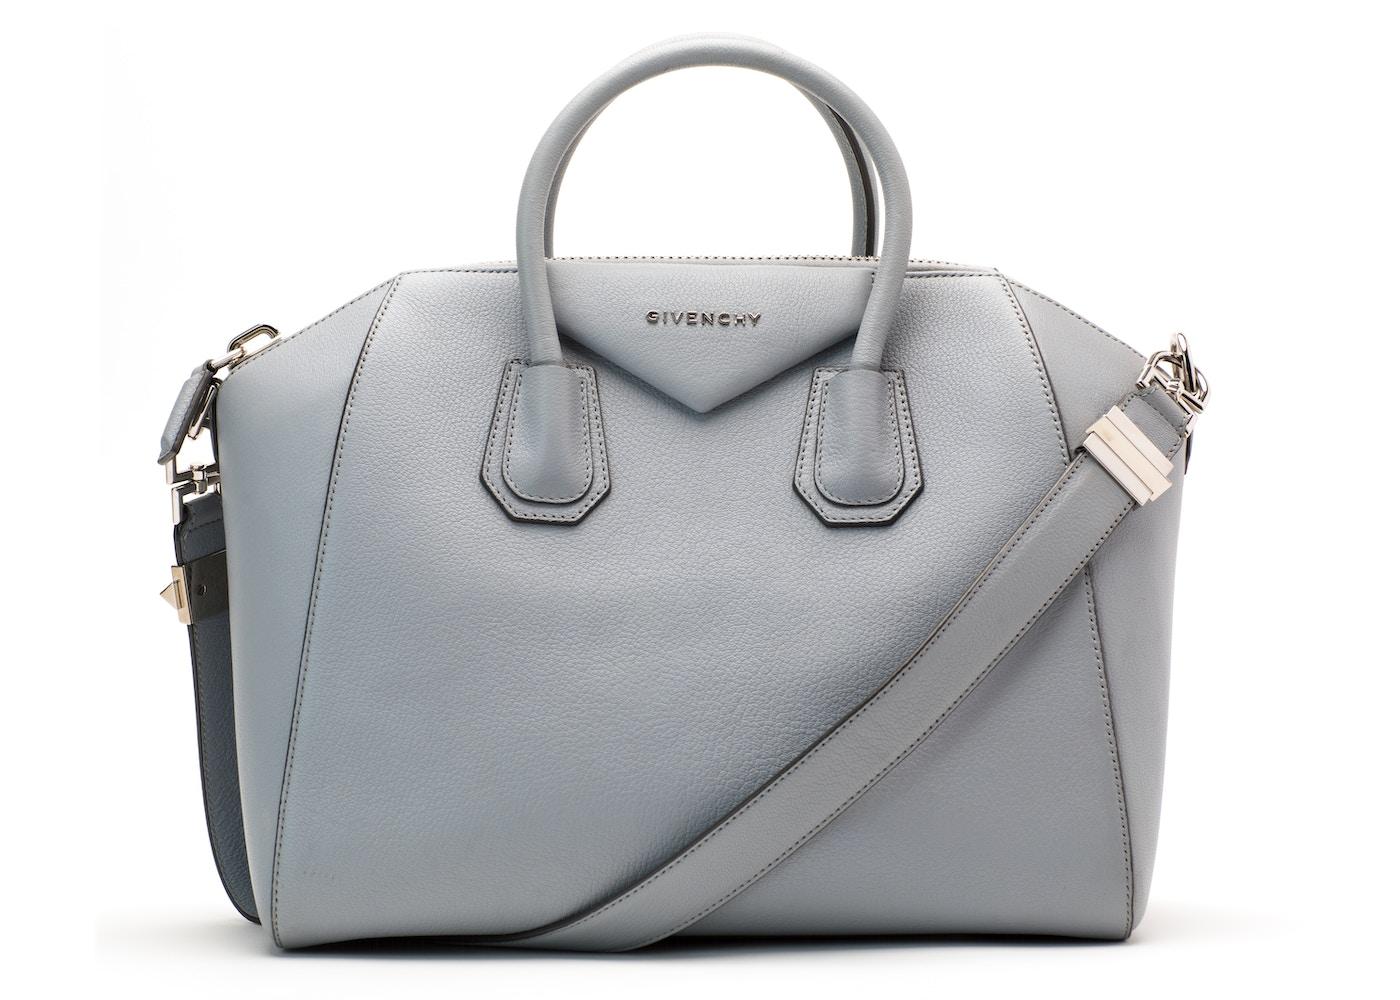 df47ce464392b Givenchy Antigona Tote Sugar Goatskin Medium Grey Blue. Sugar Goatskin  Medium Grey Blue